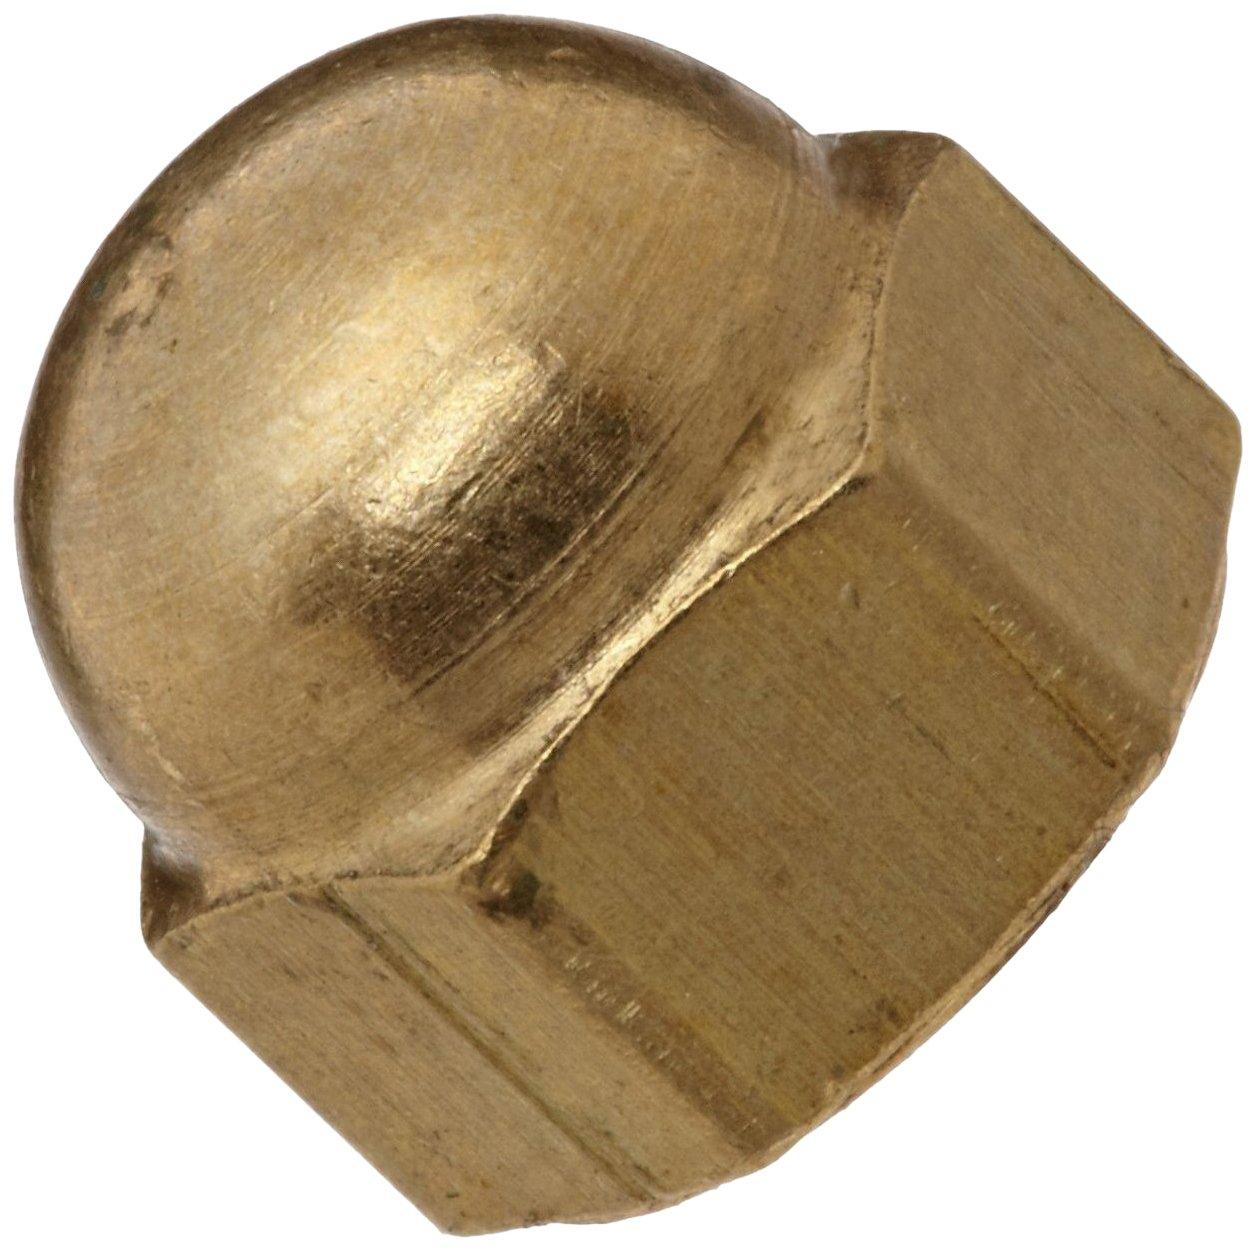 Brass Acorn Nut USA specialty shop Made 8-32 5 16